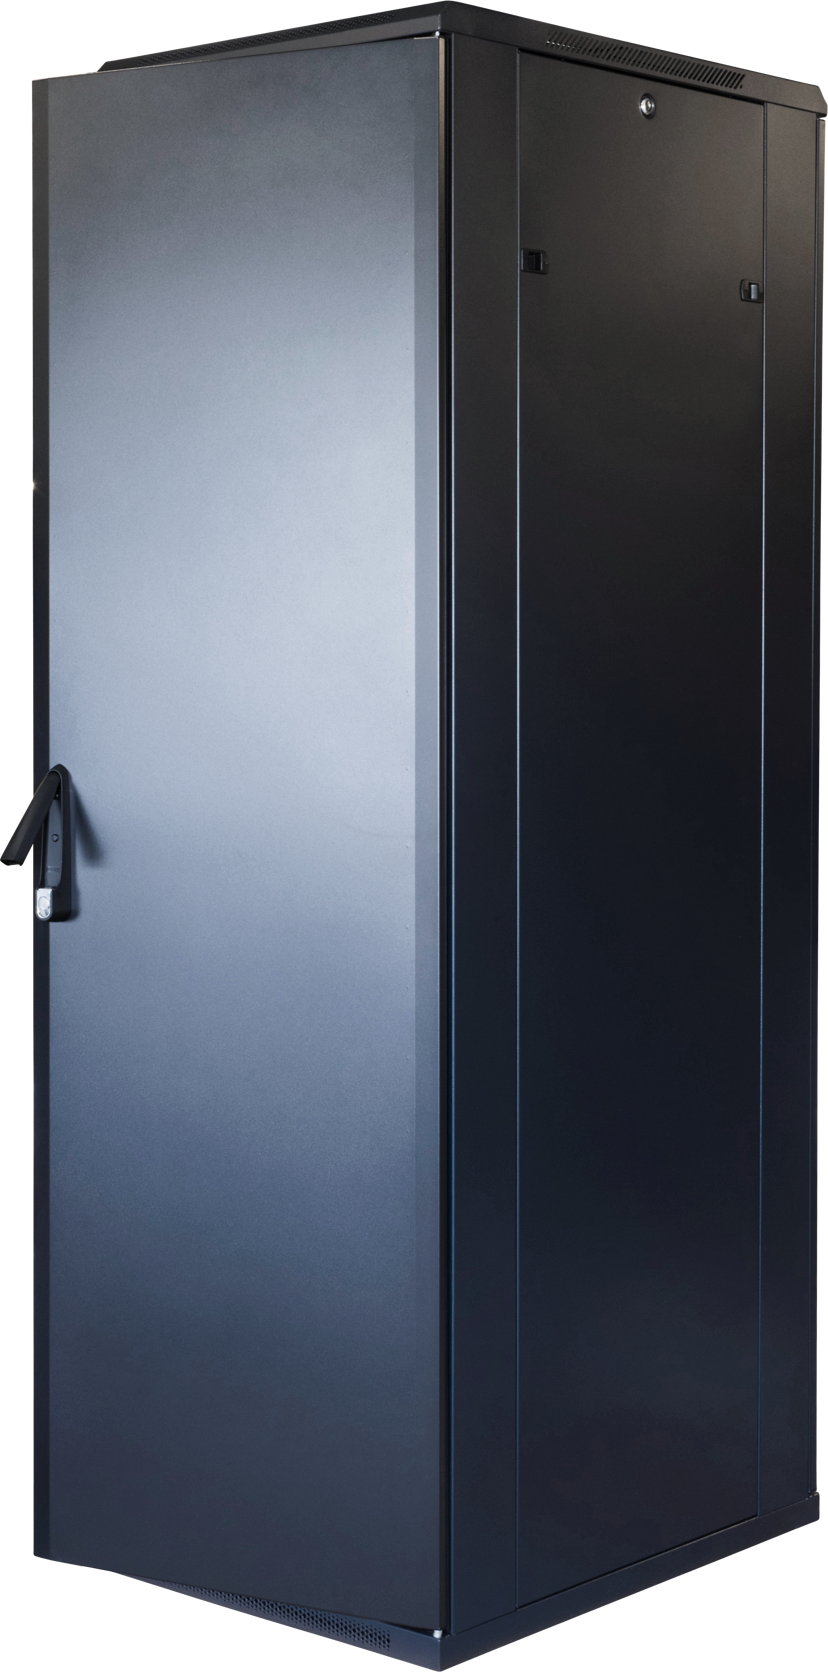 "Toten G6 19"" Rackskåp 42U 600x800 Glas/Metalldörr"